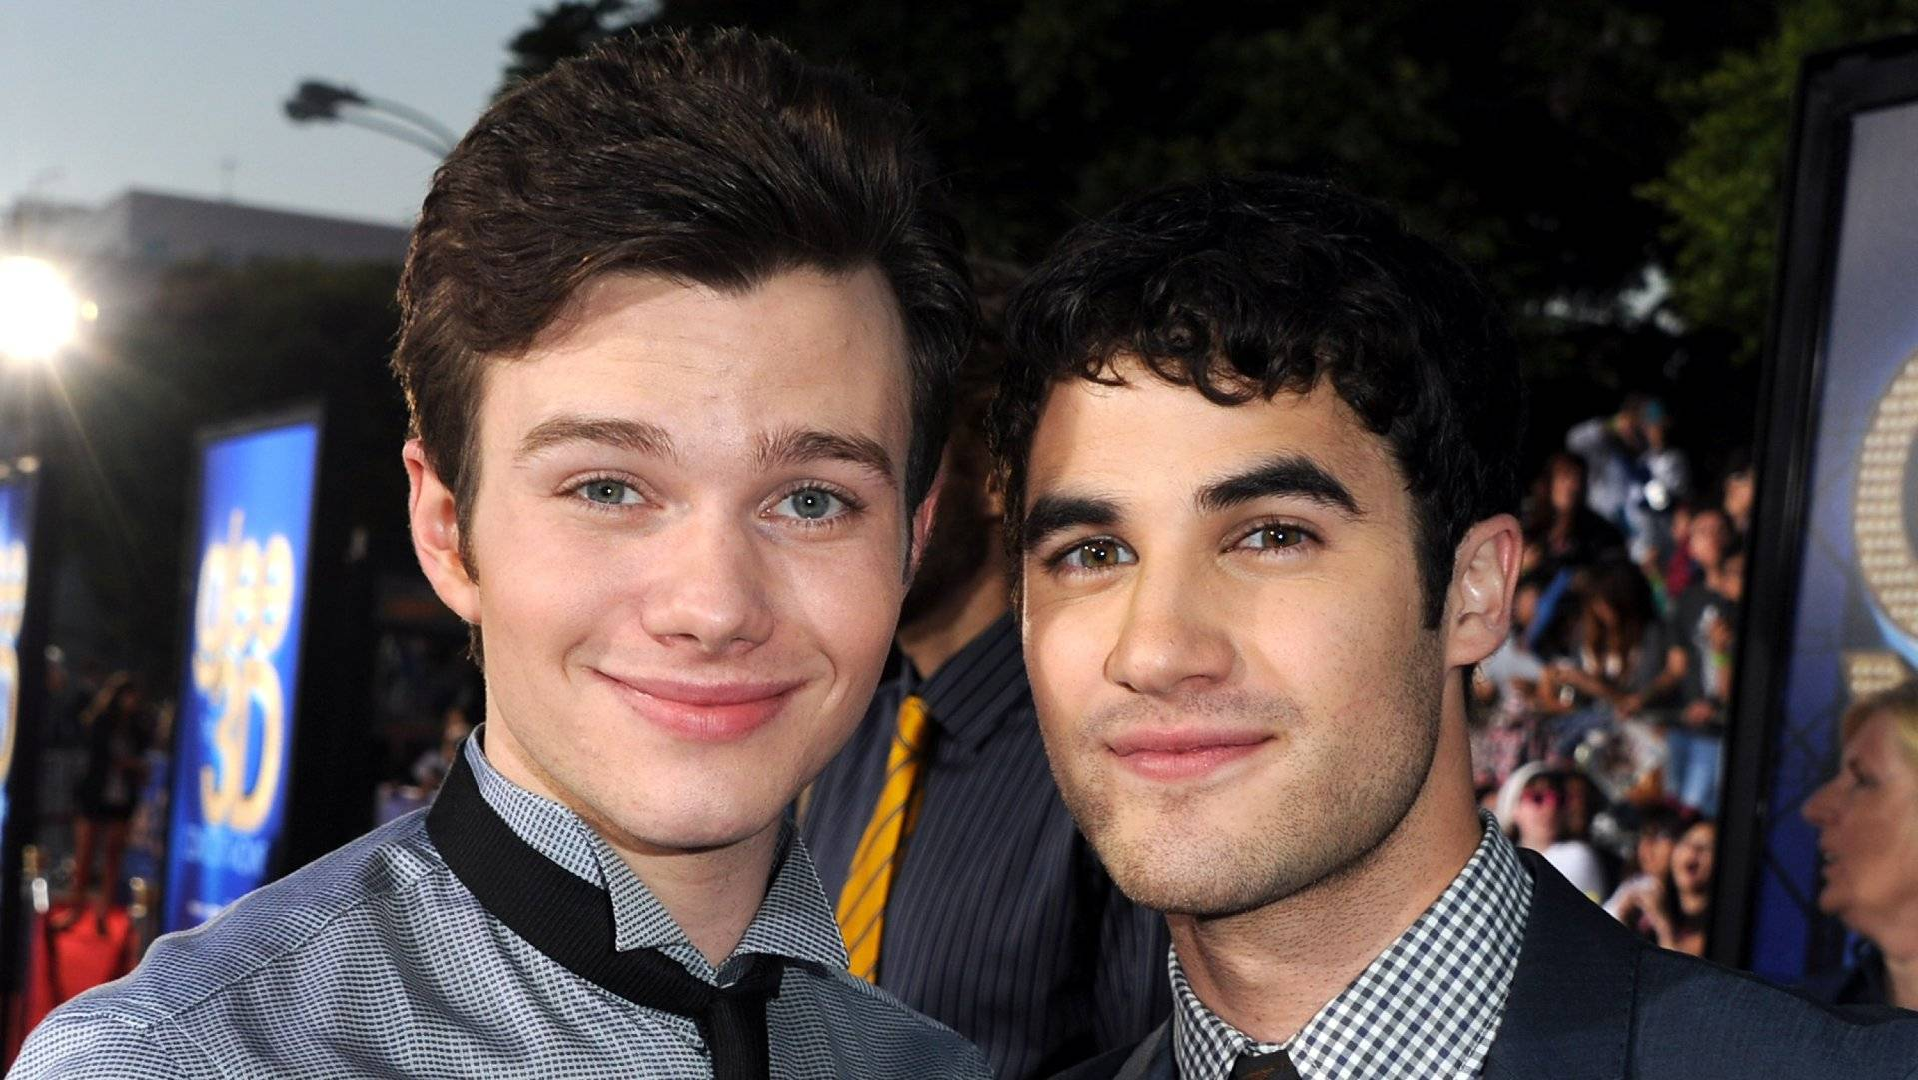 Kurt e Blaine (Glee), foto: Getty Images